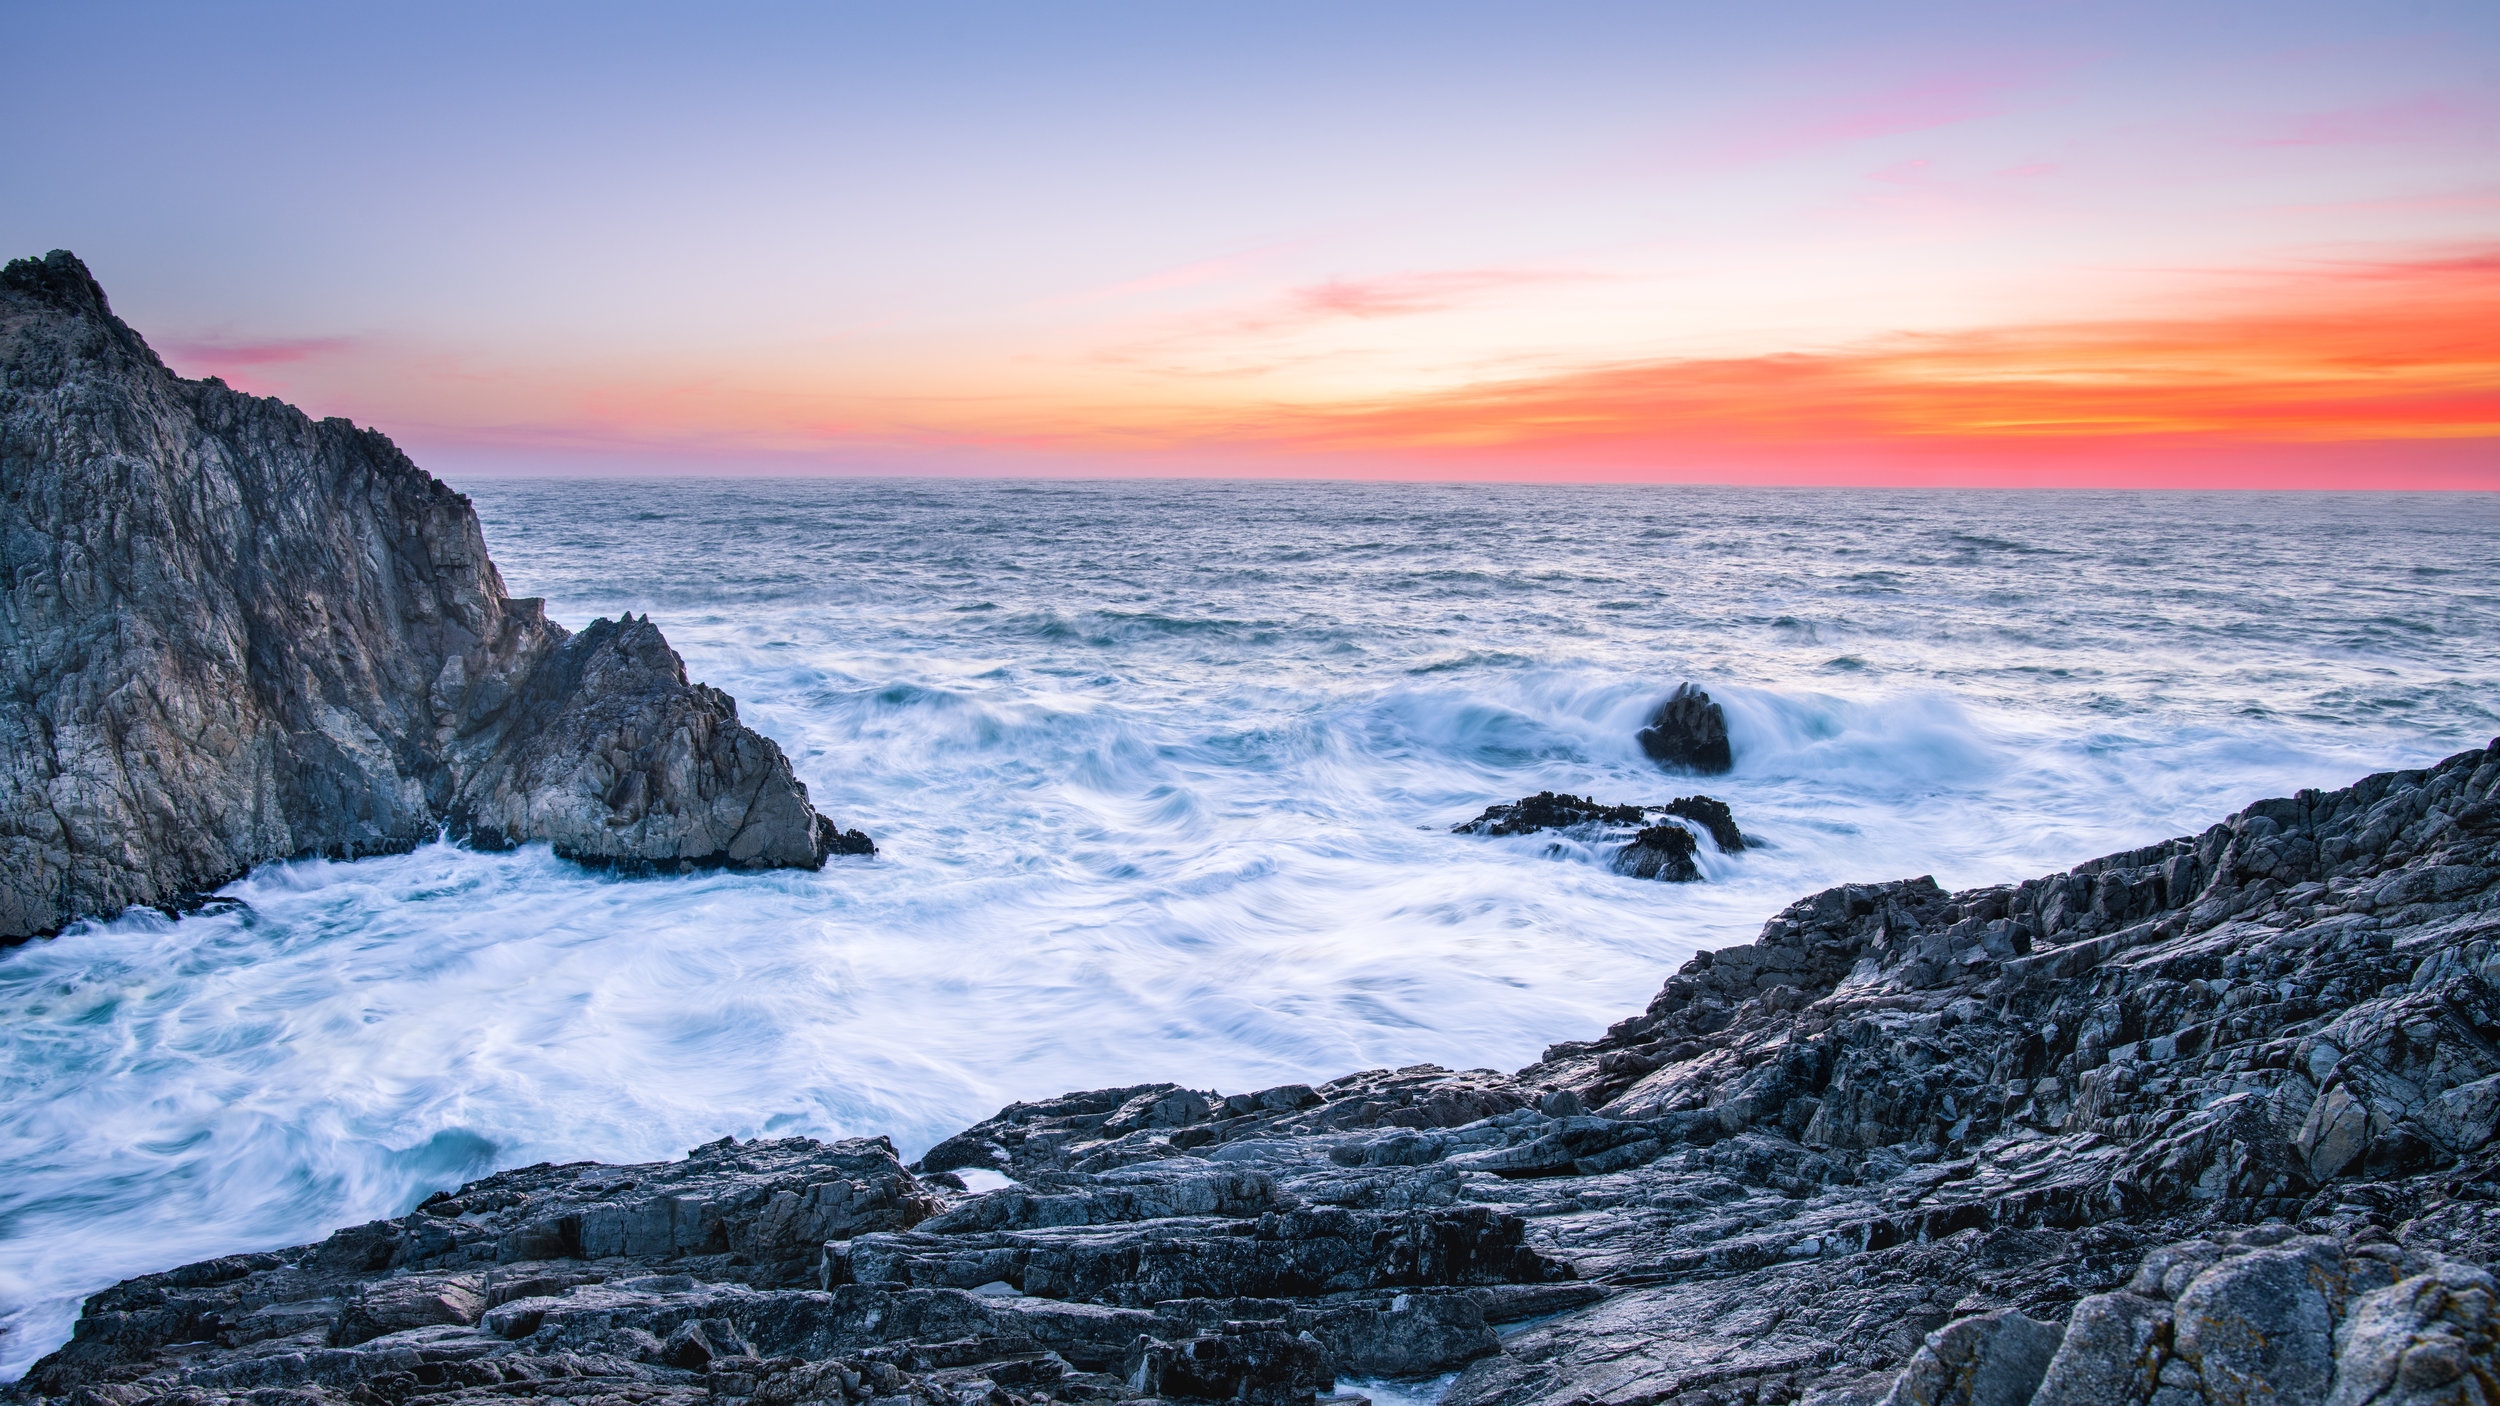 Sunset at Point Reyes National Seashore